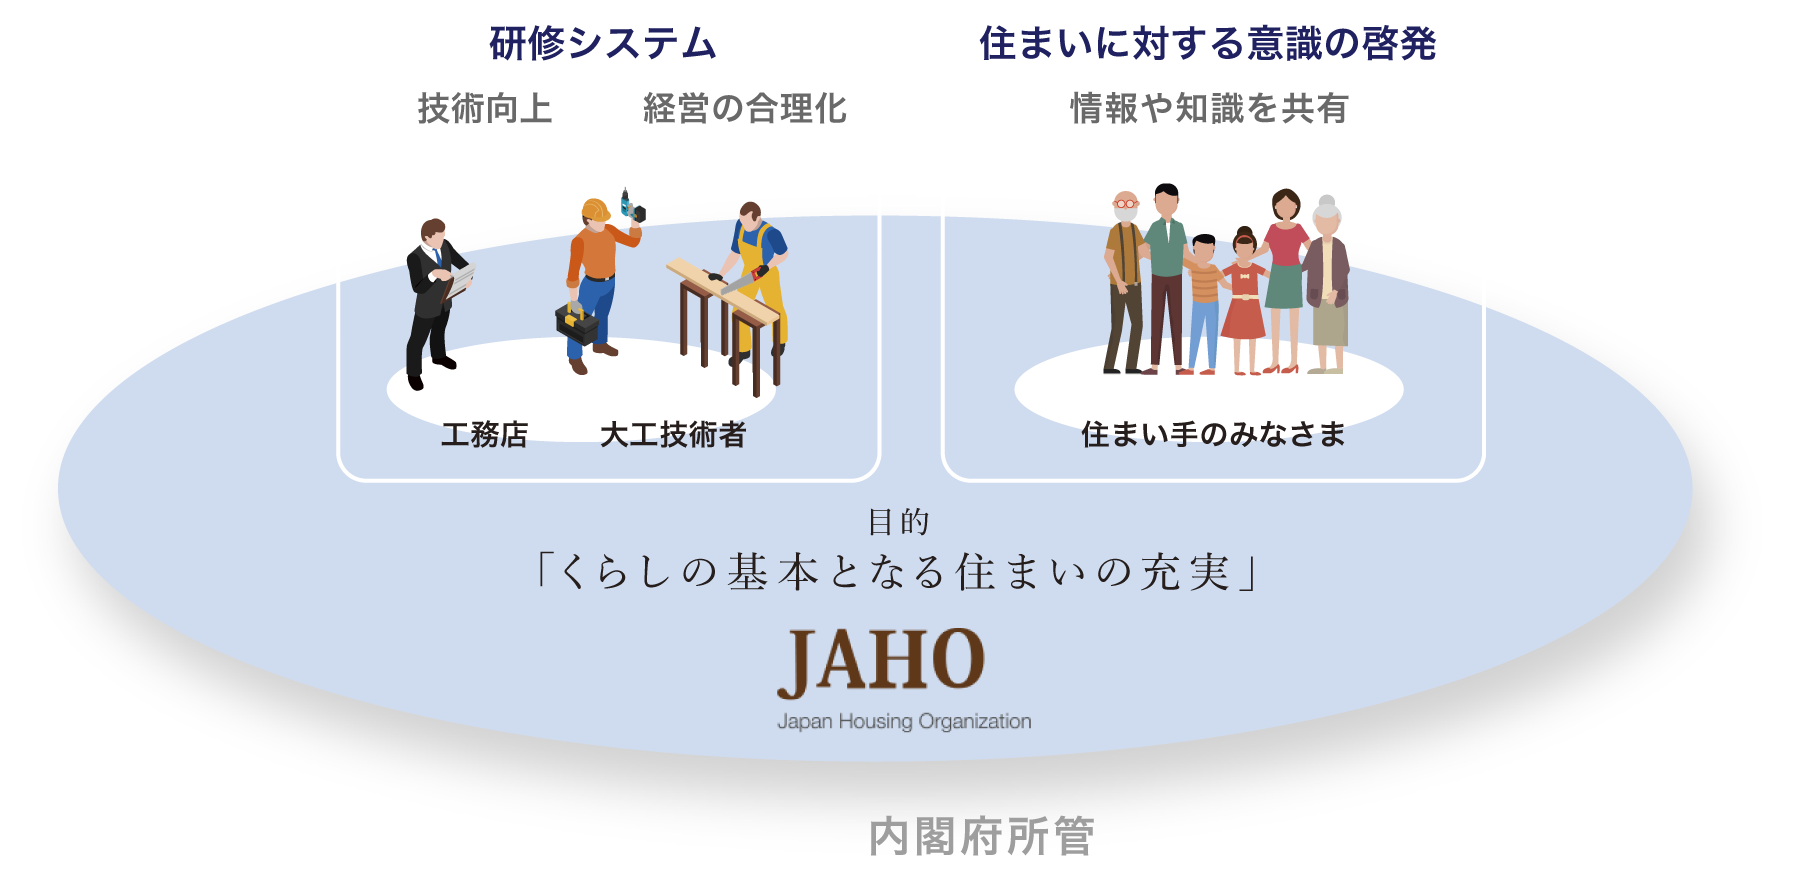 JAHOの目的 | 「くらしの基本となる住まいの充実」